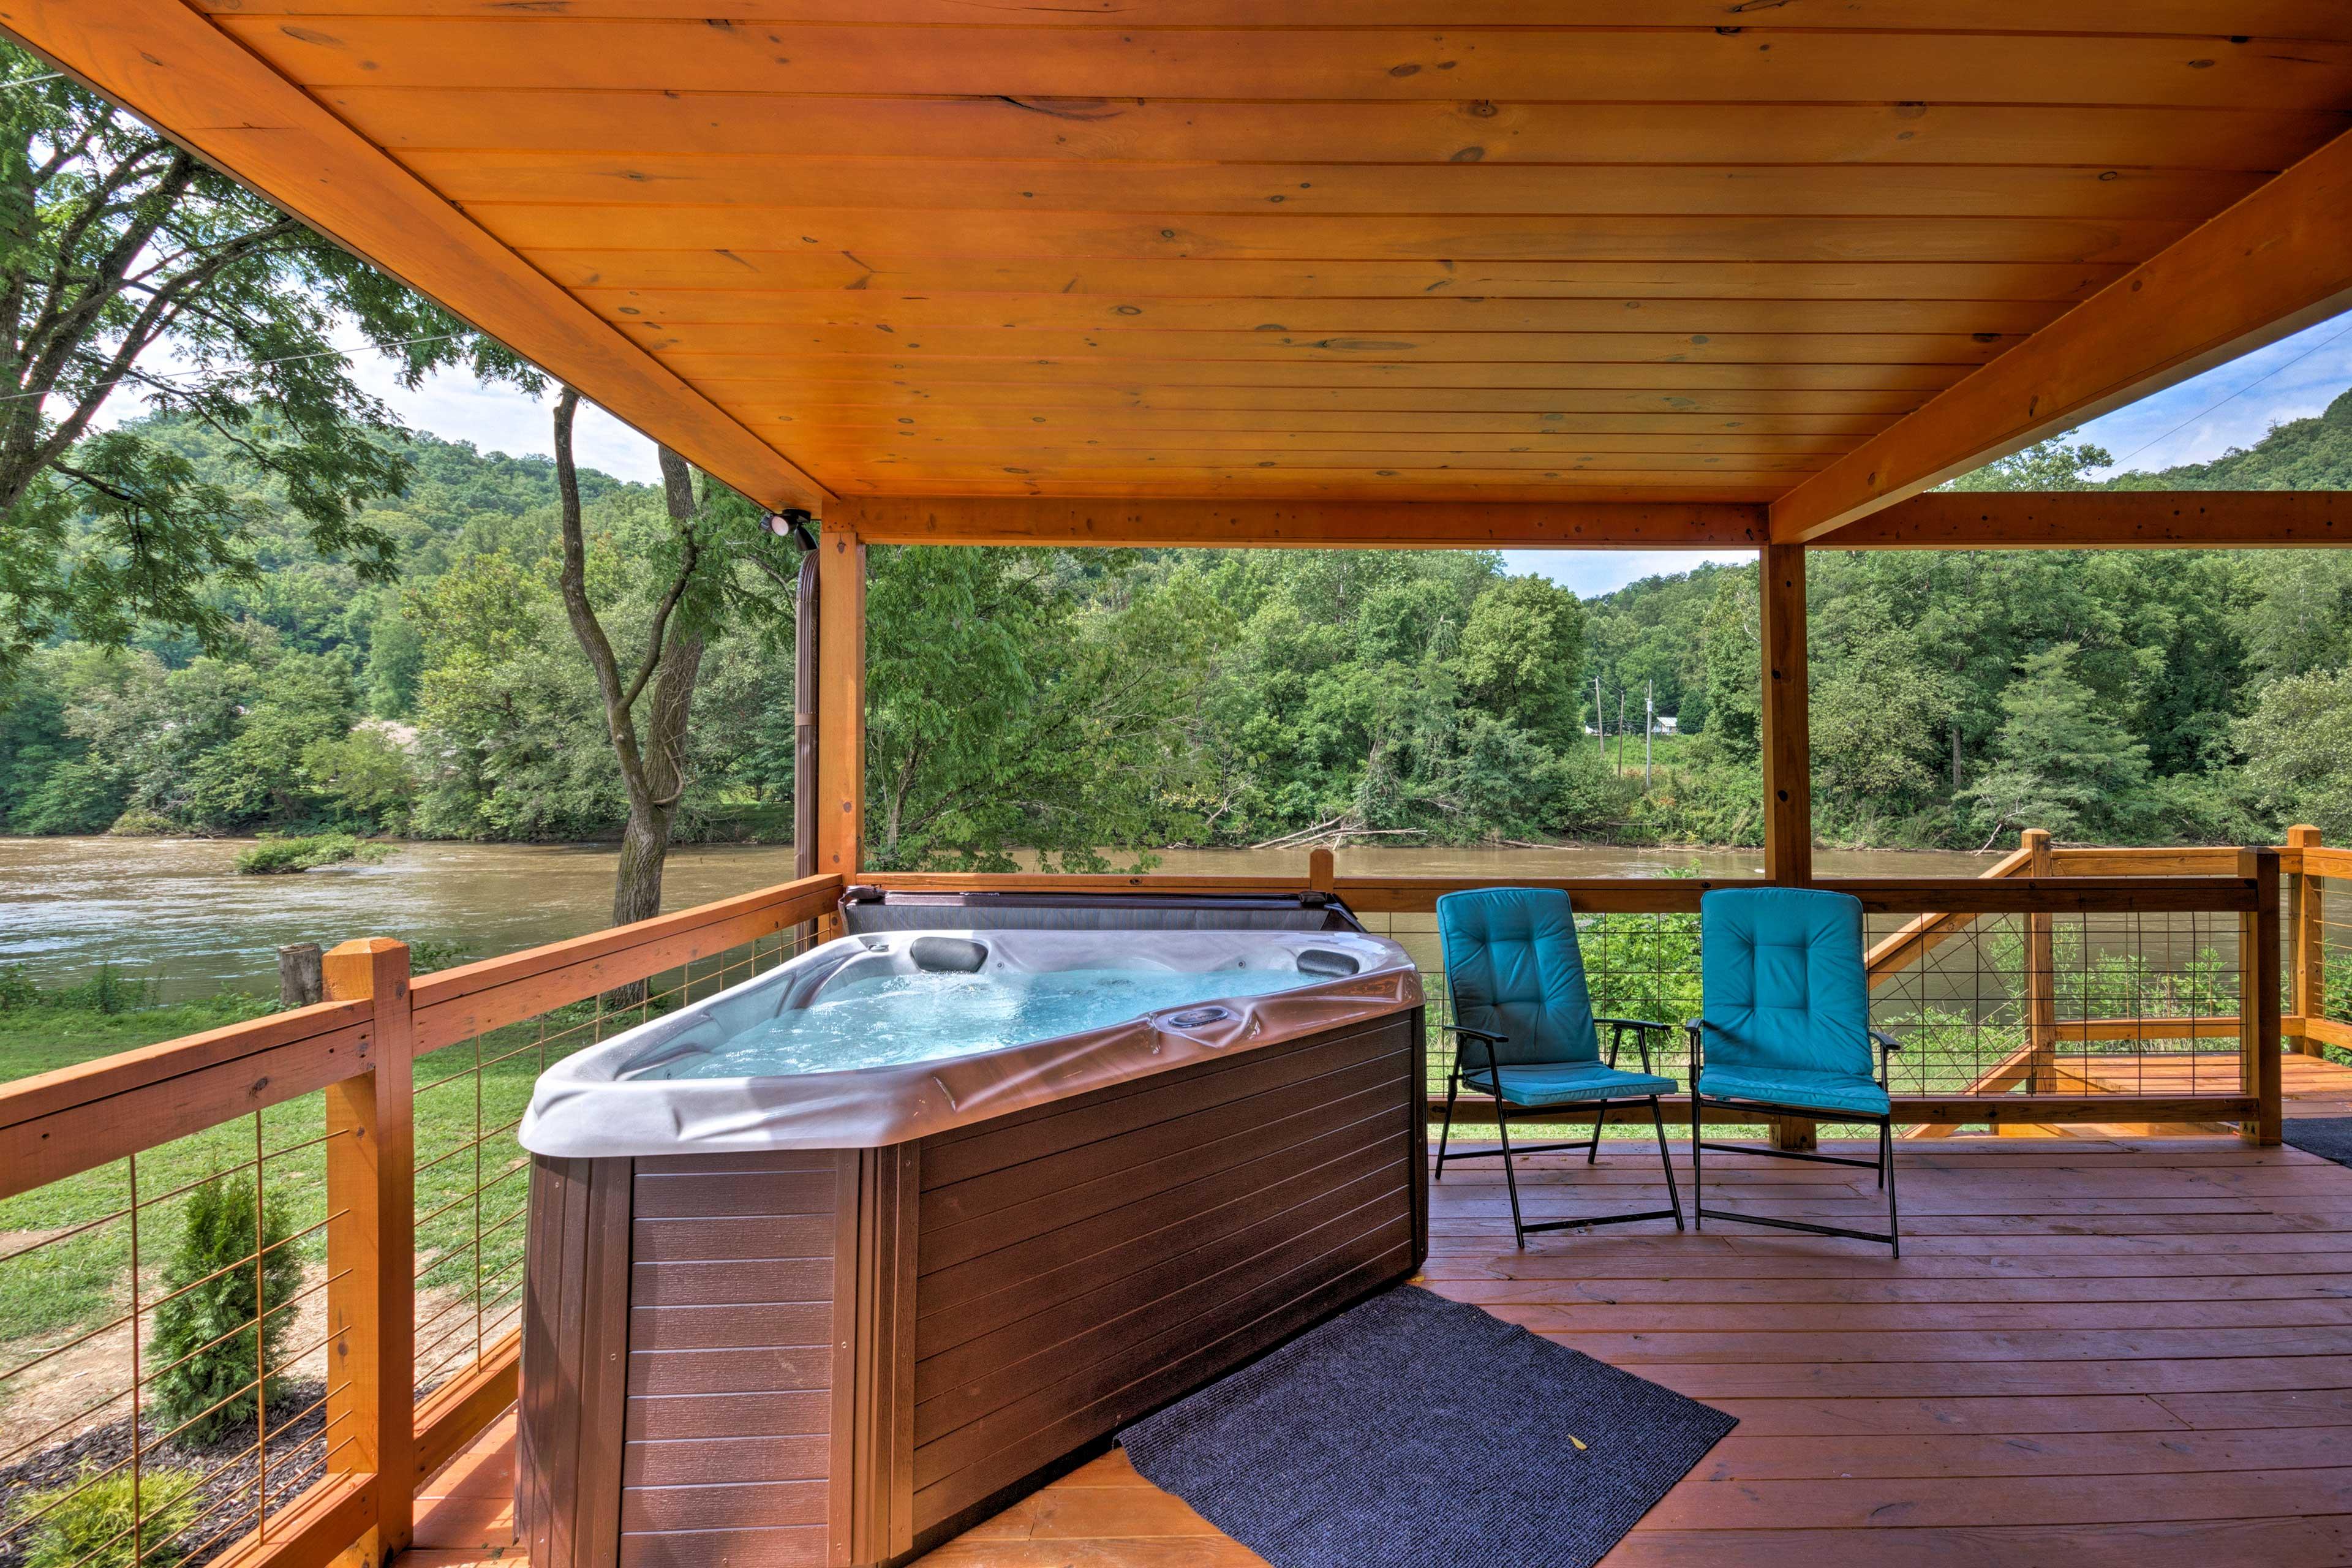 Take a relaxing soak in the hot tub.